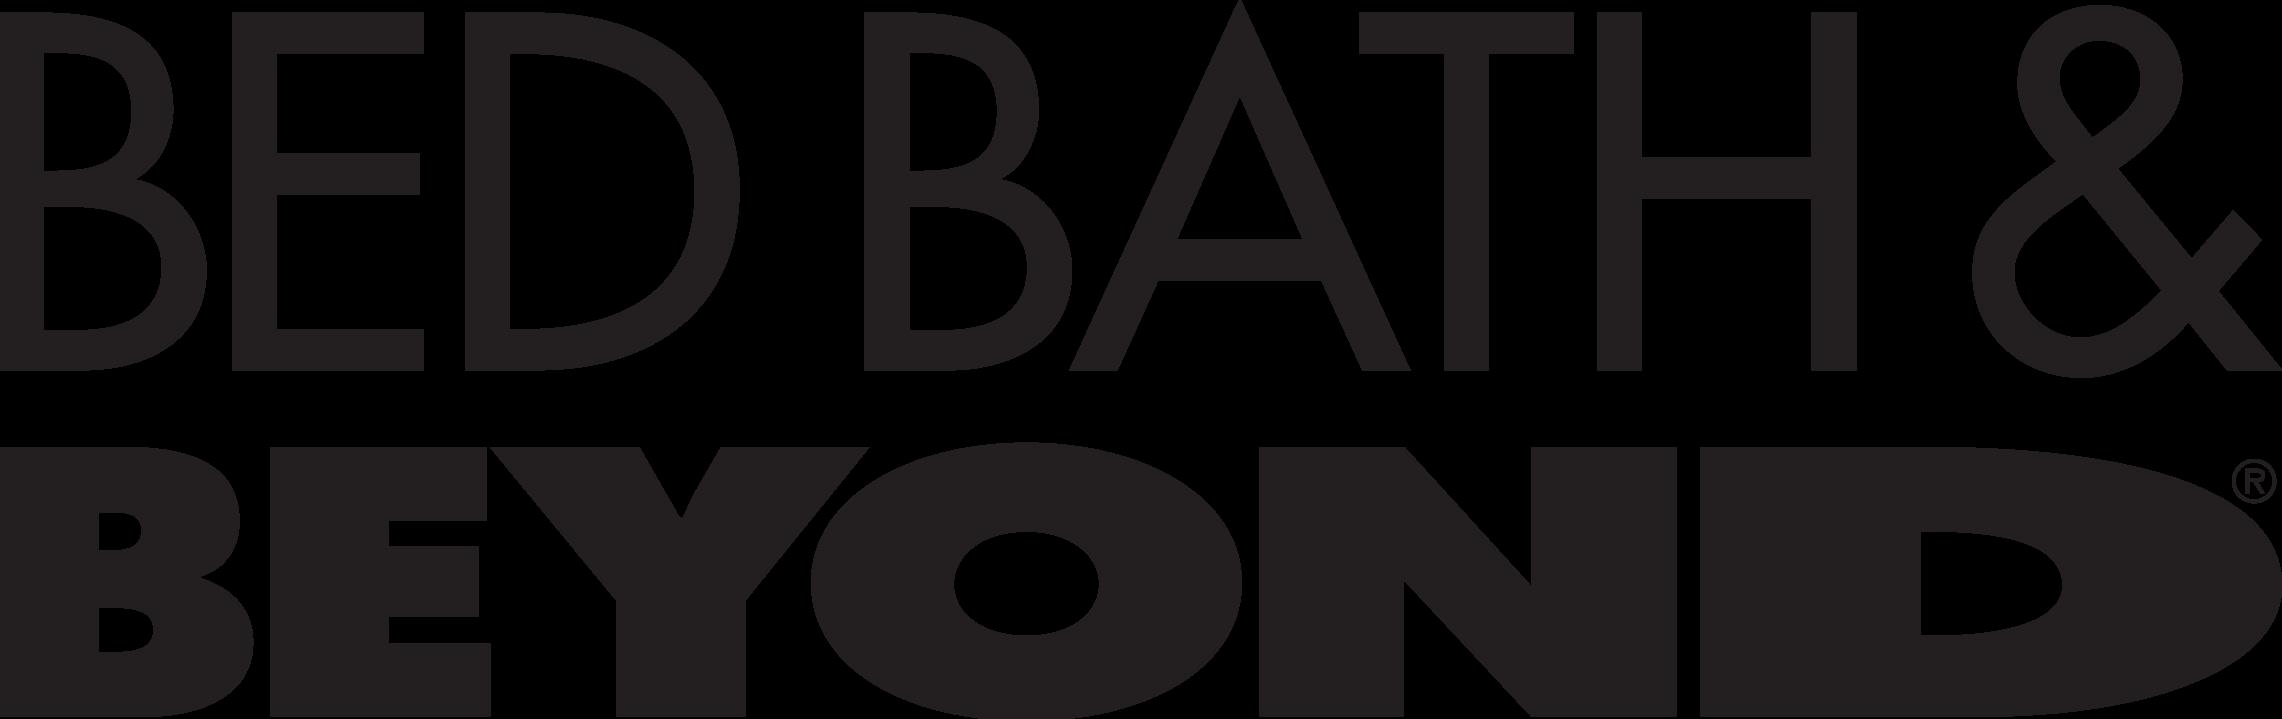 HD Bed Bath & Beyond.